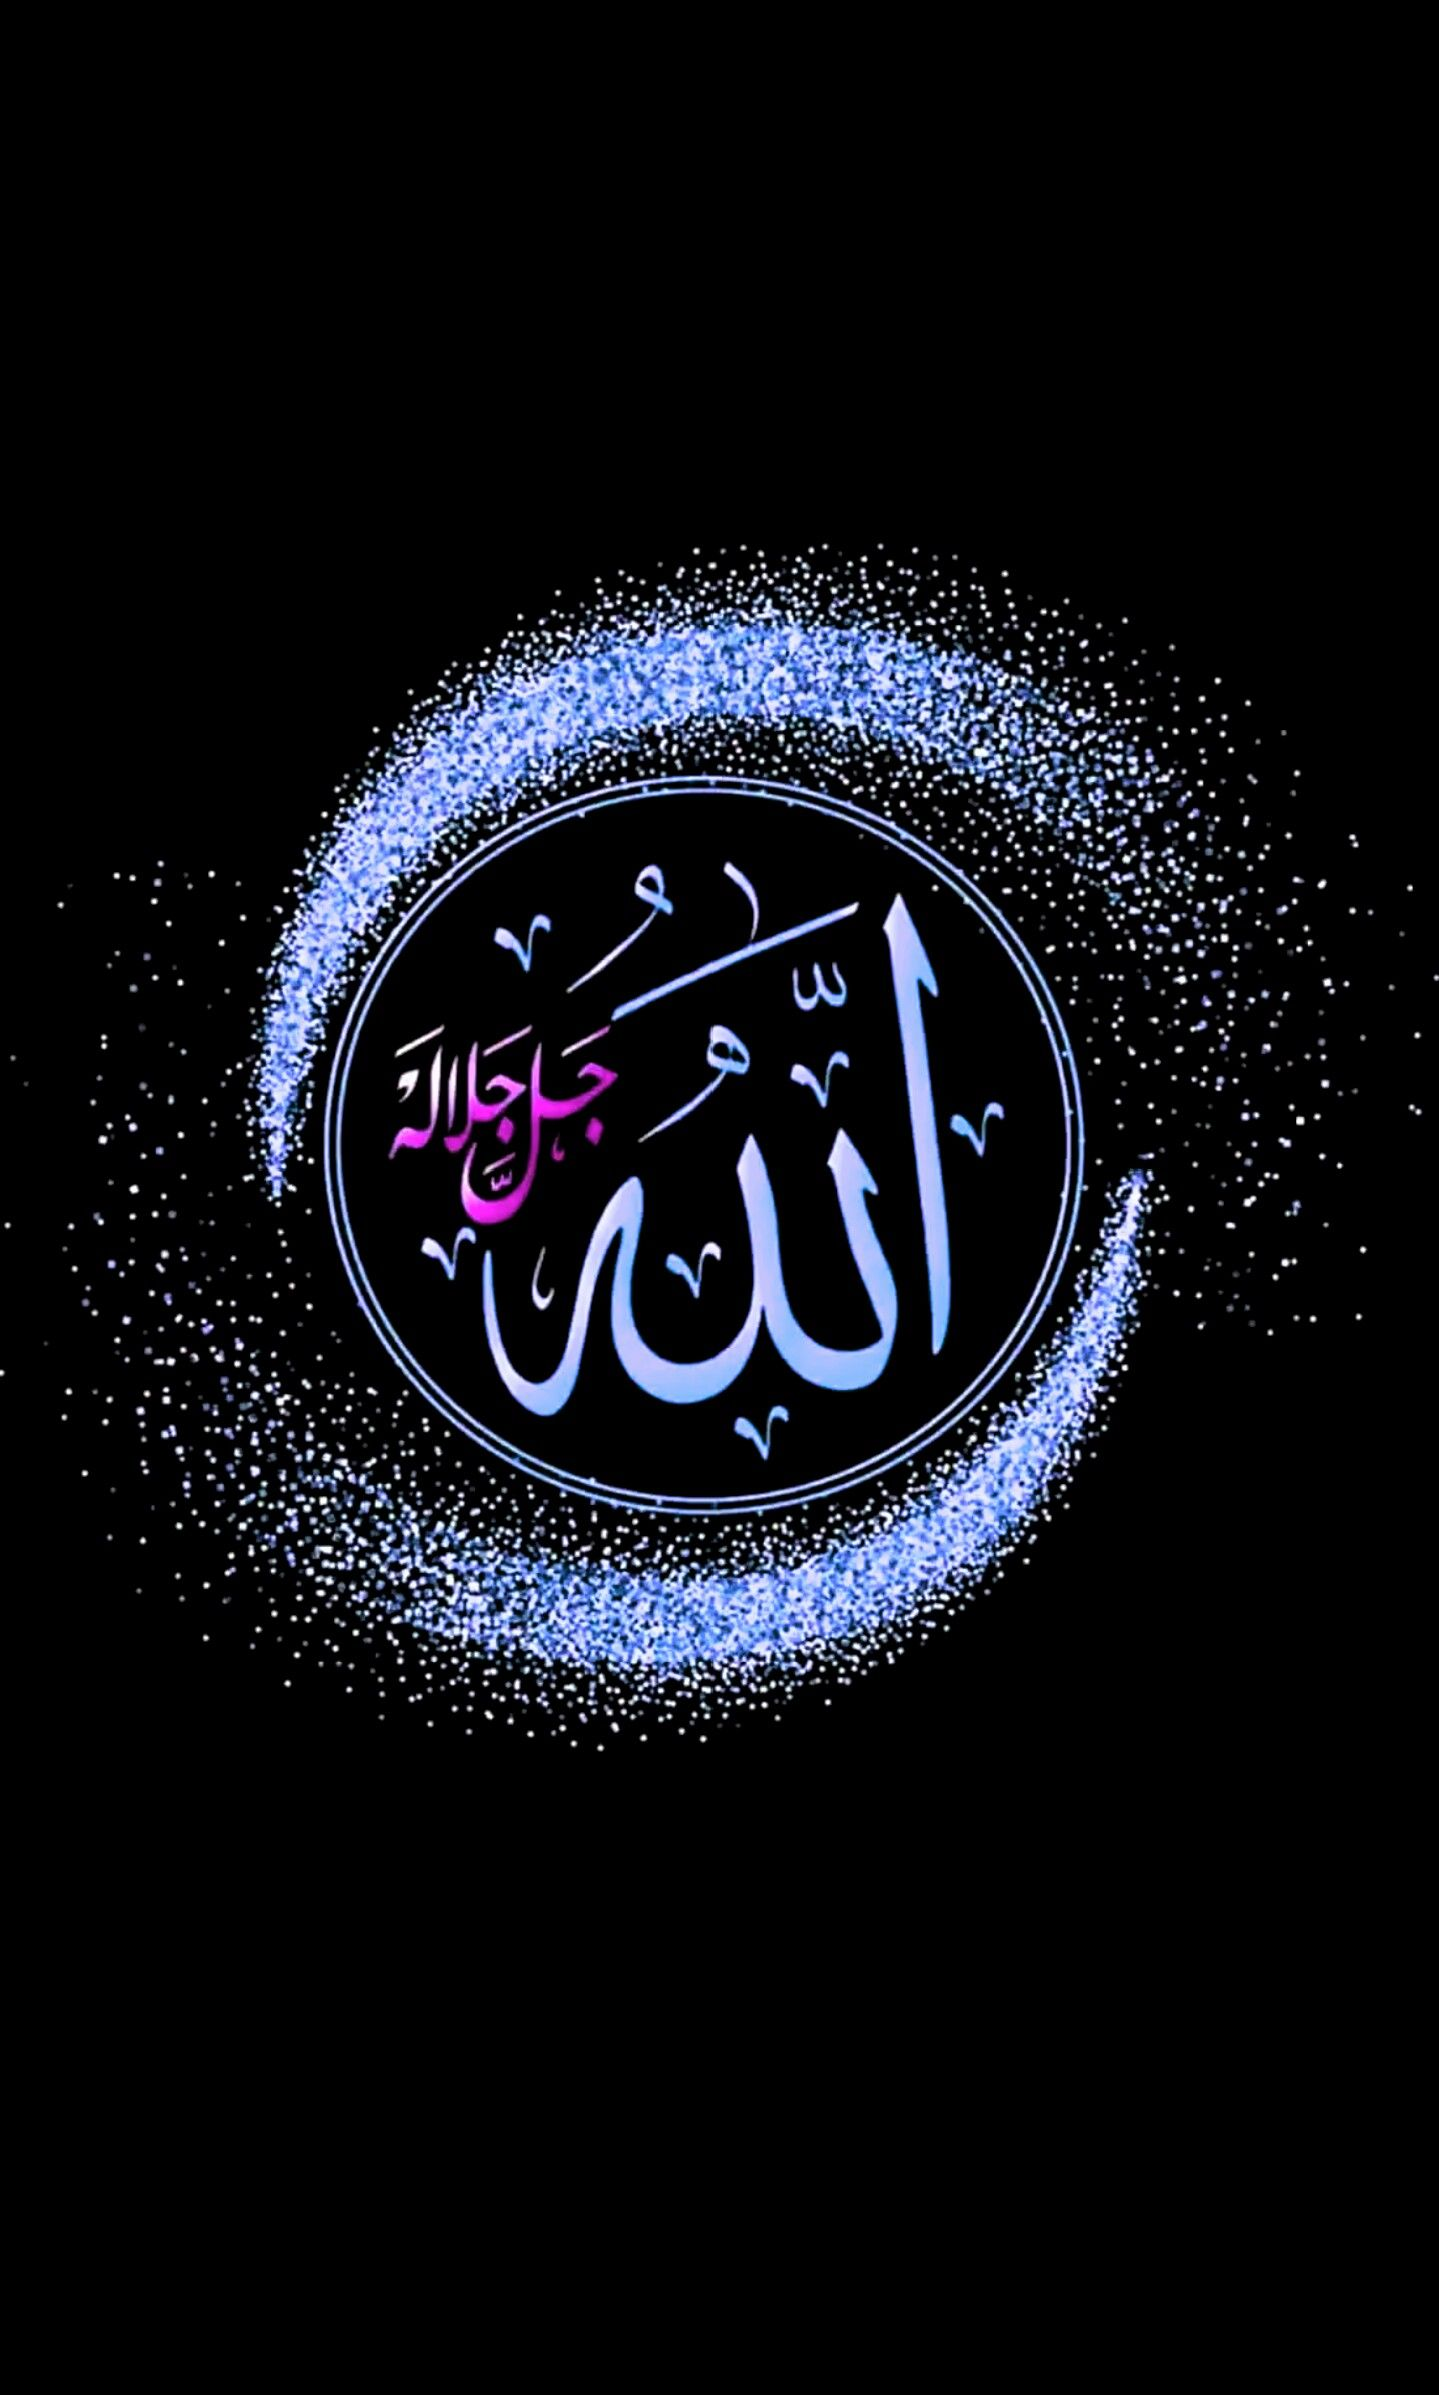 Pin Oleh Sgaas Sgaas Di Kiymetli Sozler Seni Kaligrafi Arab Seni Kaligrafi Seni Islami